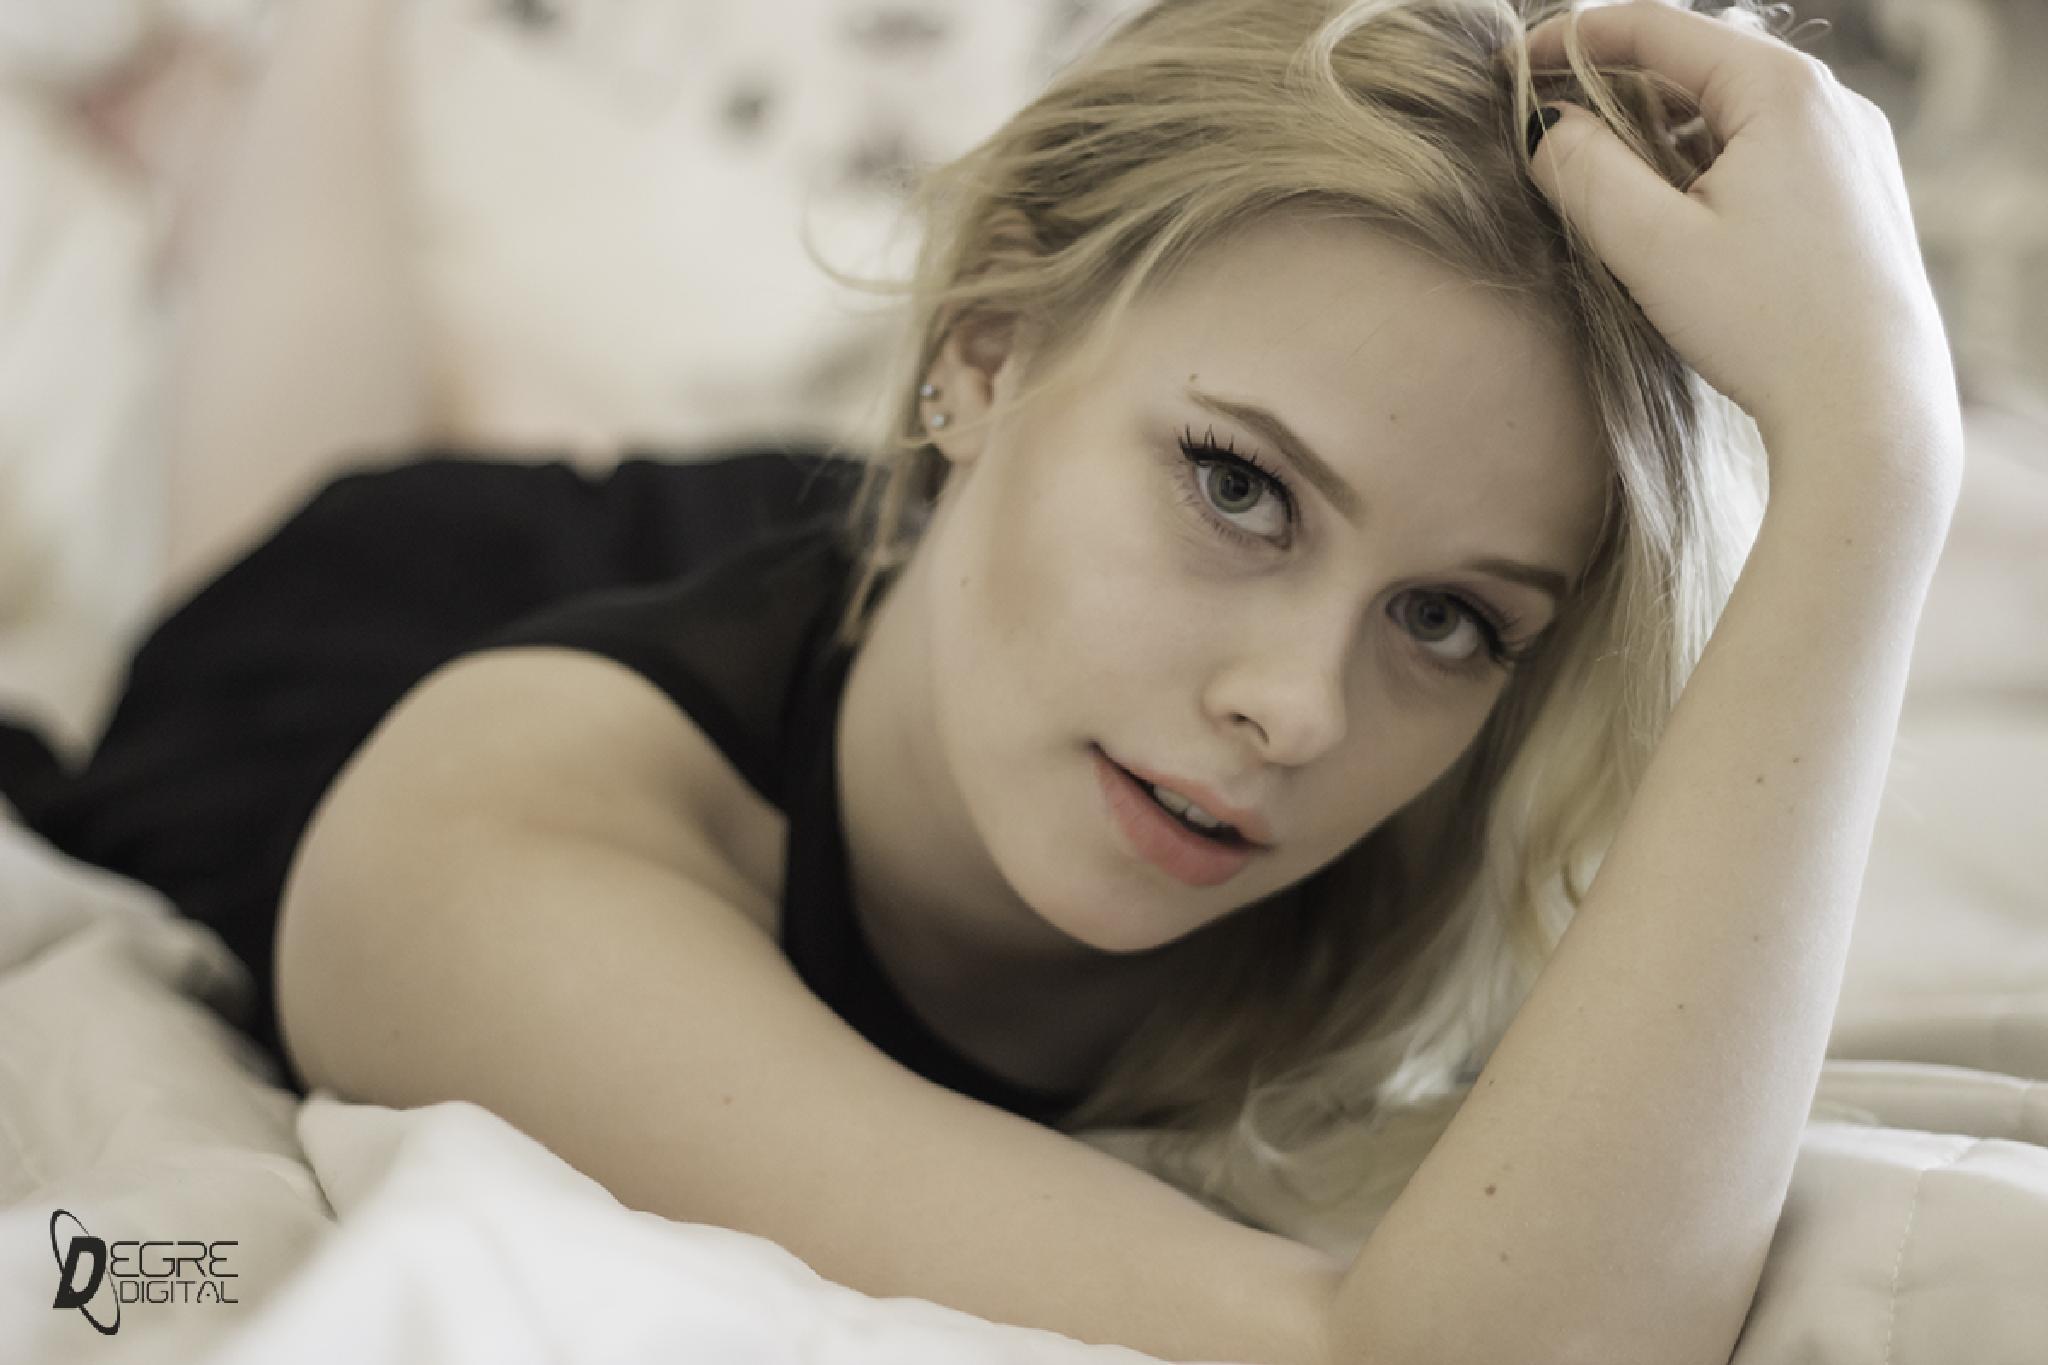 blonde girl by Degre Digital